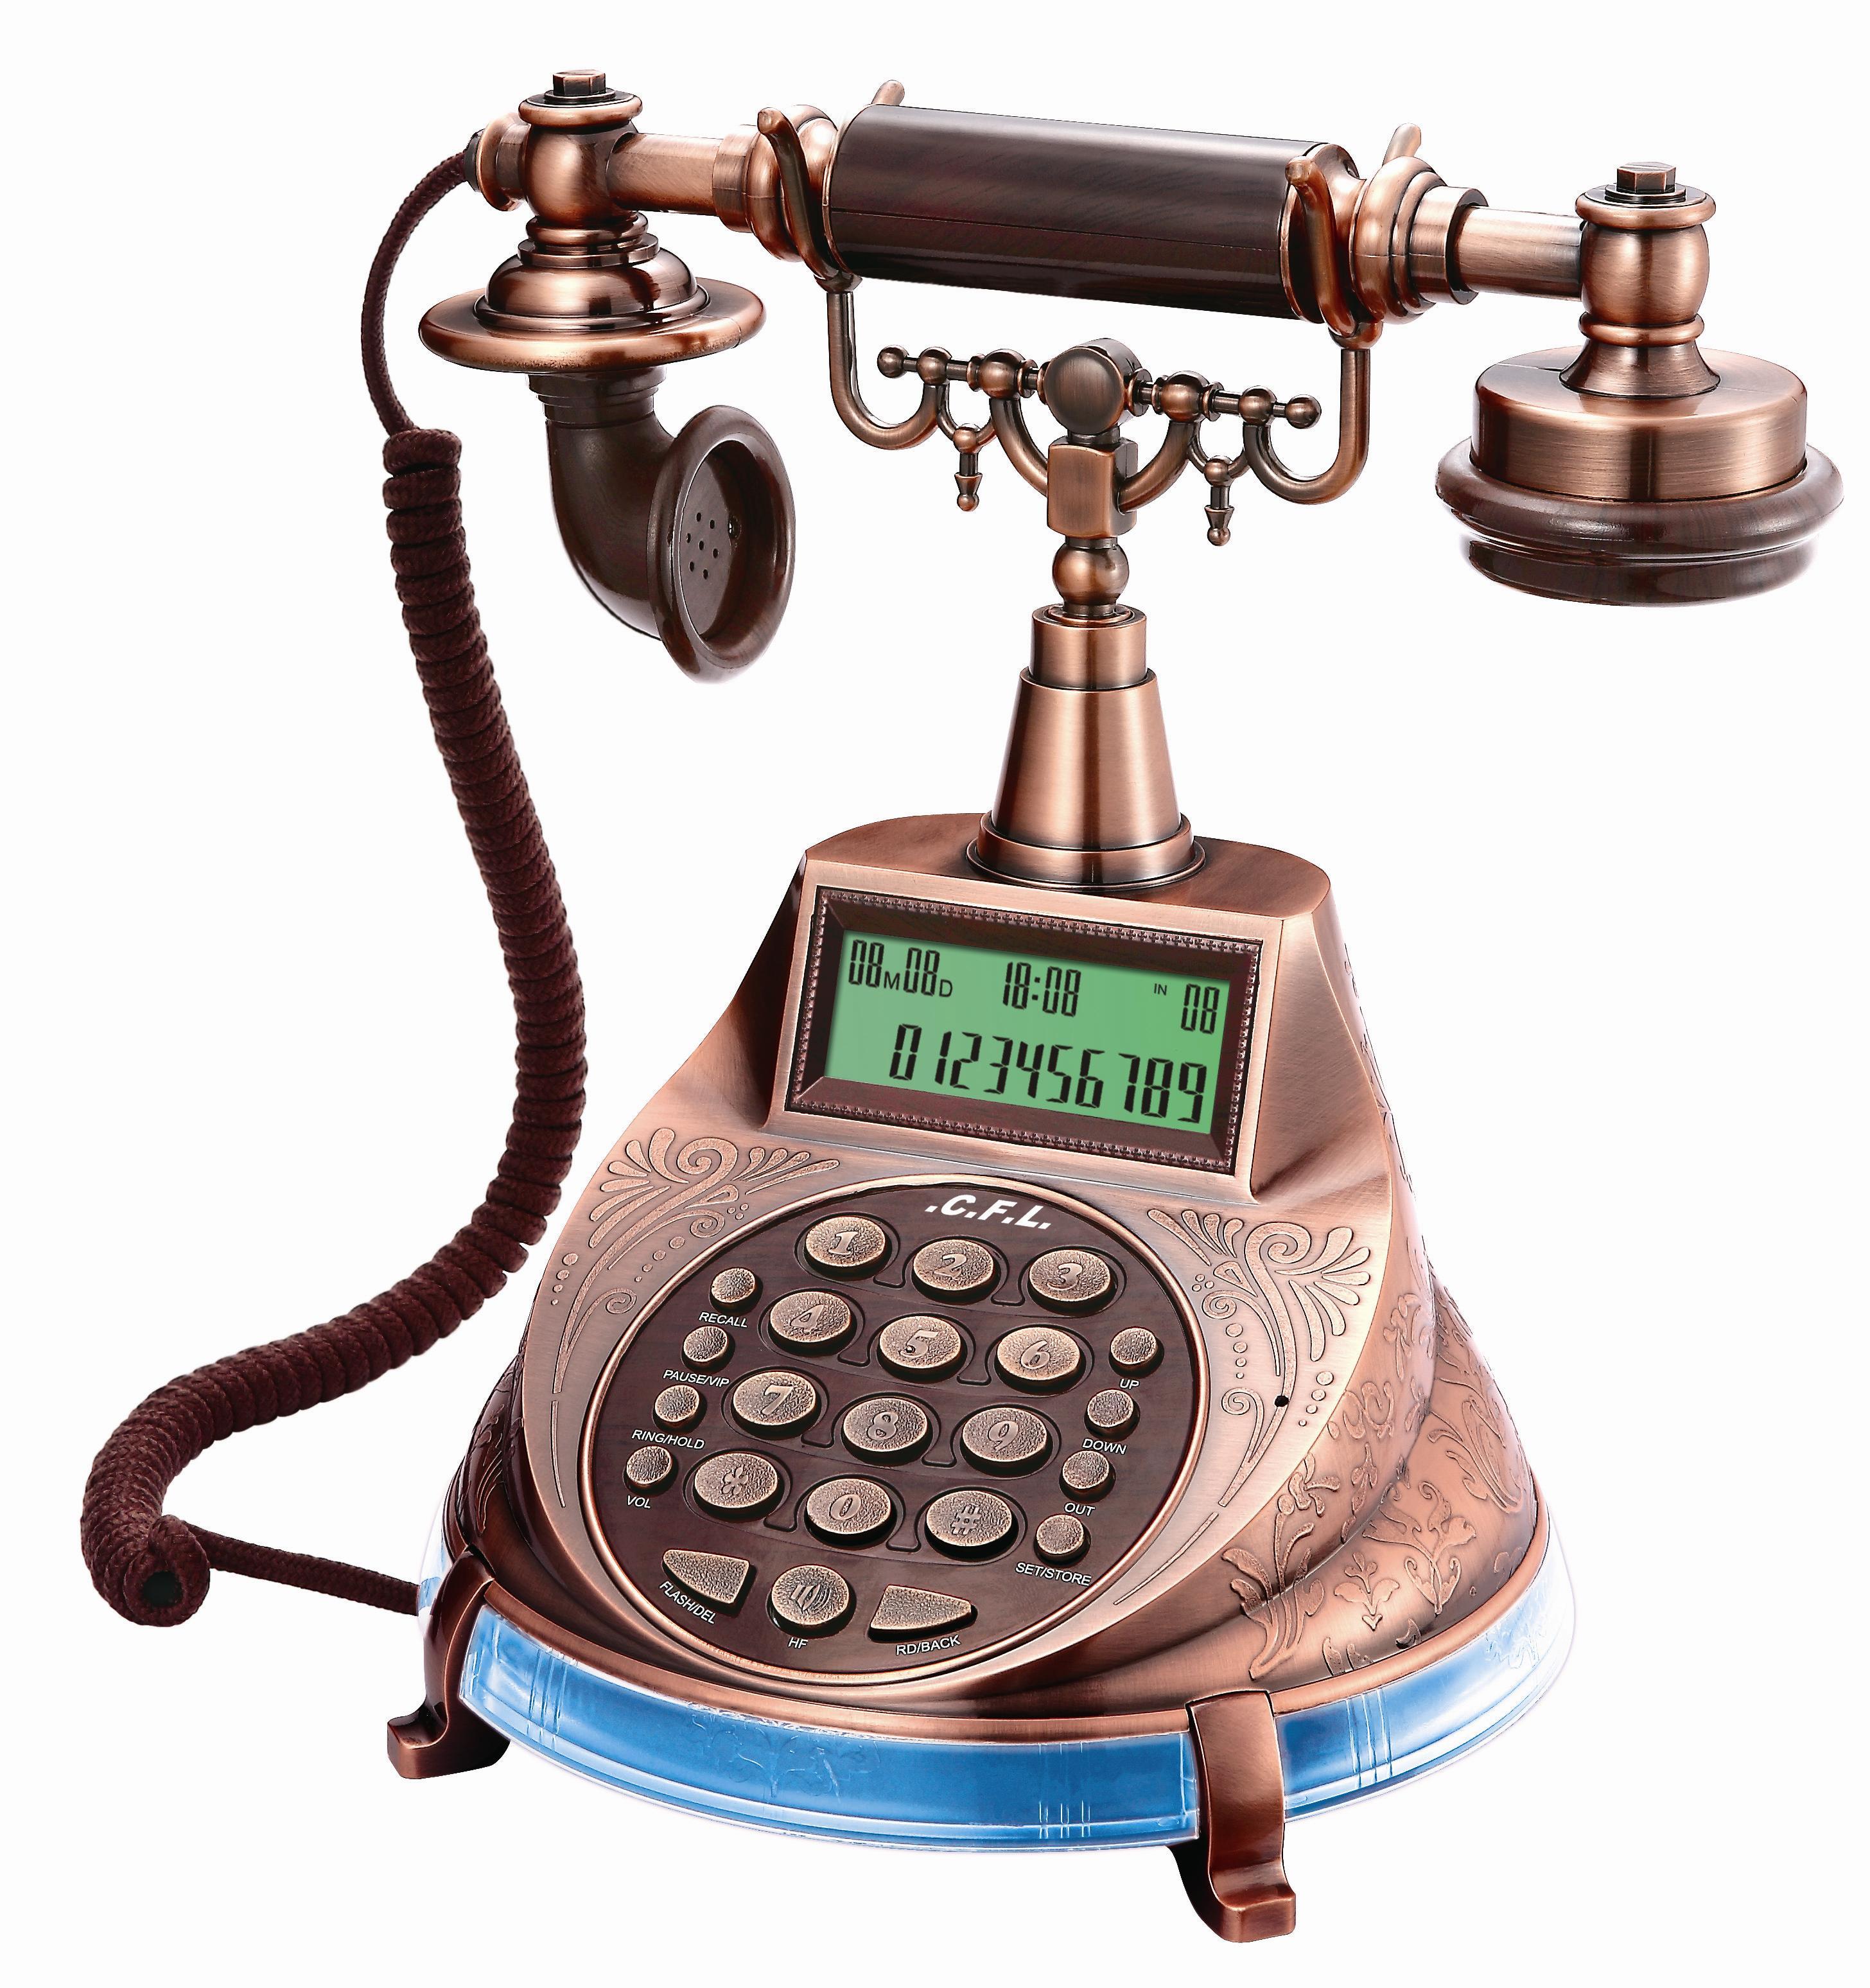 تلفن سی اف ال سلطنتی 1949